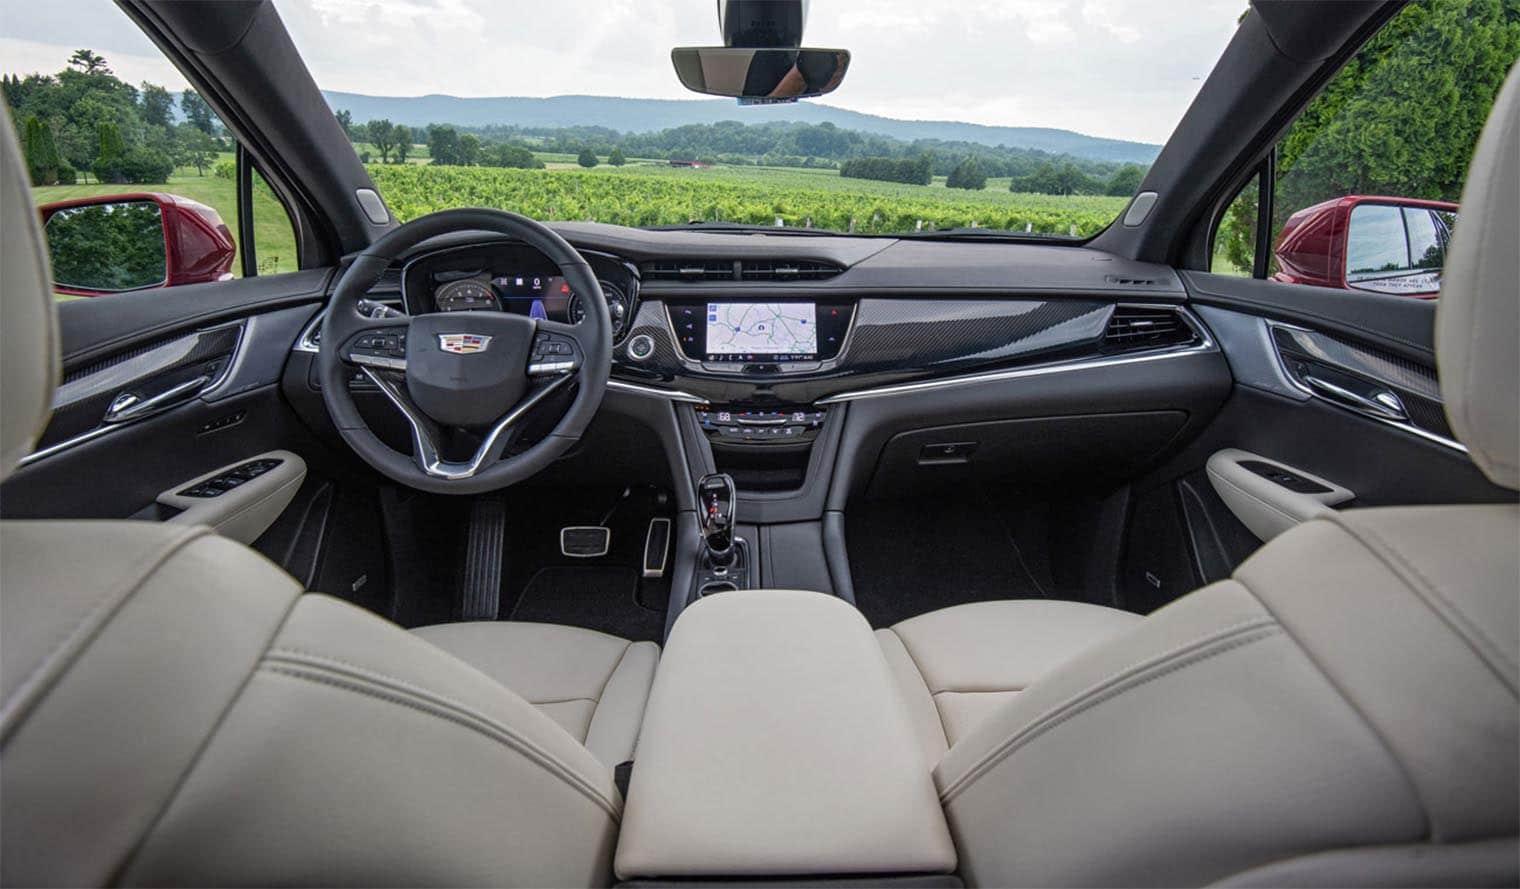 First Drive: 2020 Cadillac XT6 | TheDetroitBureau.com